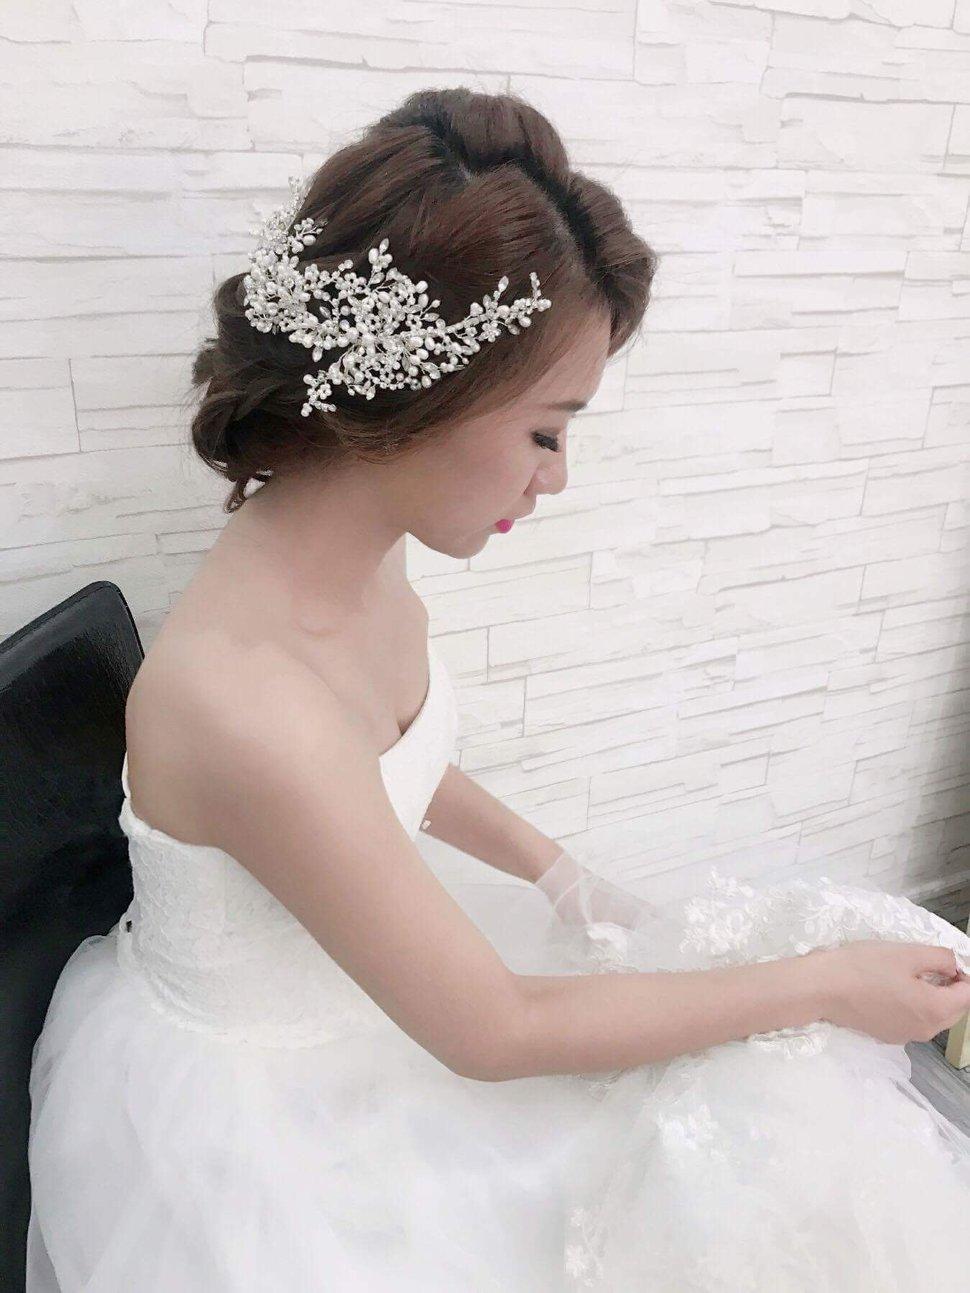 679C0665-24FF-4011-981F-8A6EF2DC98DF - Beauty愛美麗·整體造型 - 結婚吧